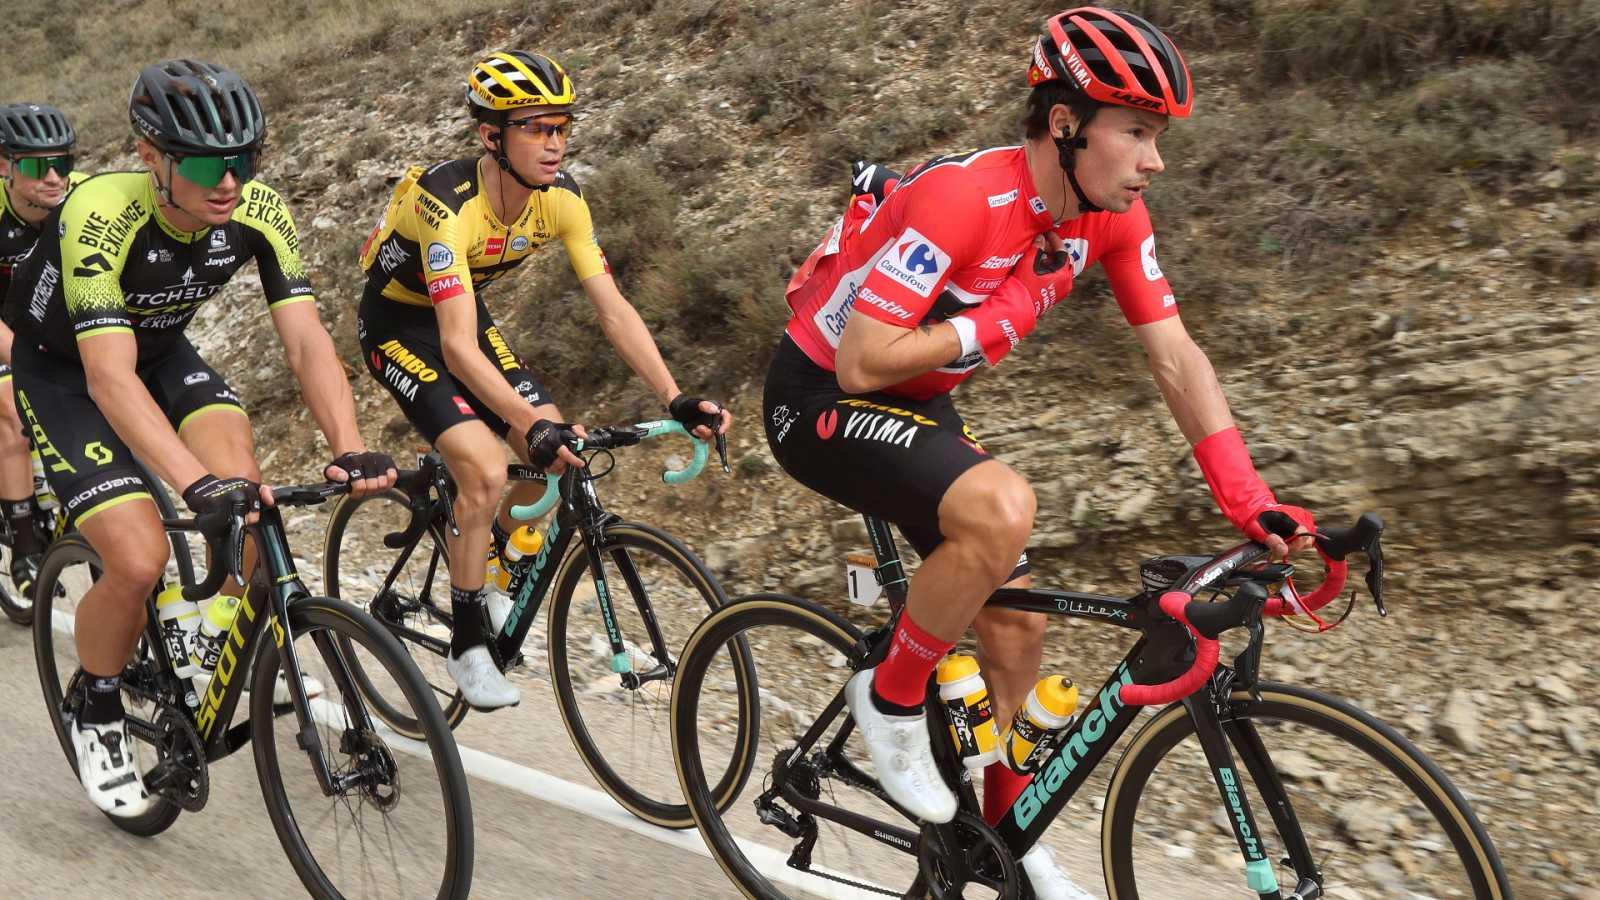 Vuelta ciclista a España 2020 - 3ª etapa: Lodosa - La Laguna Negra - Vinuesa (1) - ver ahora